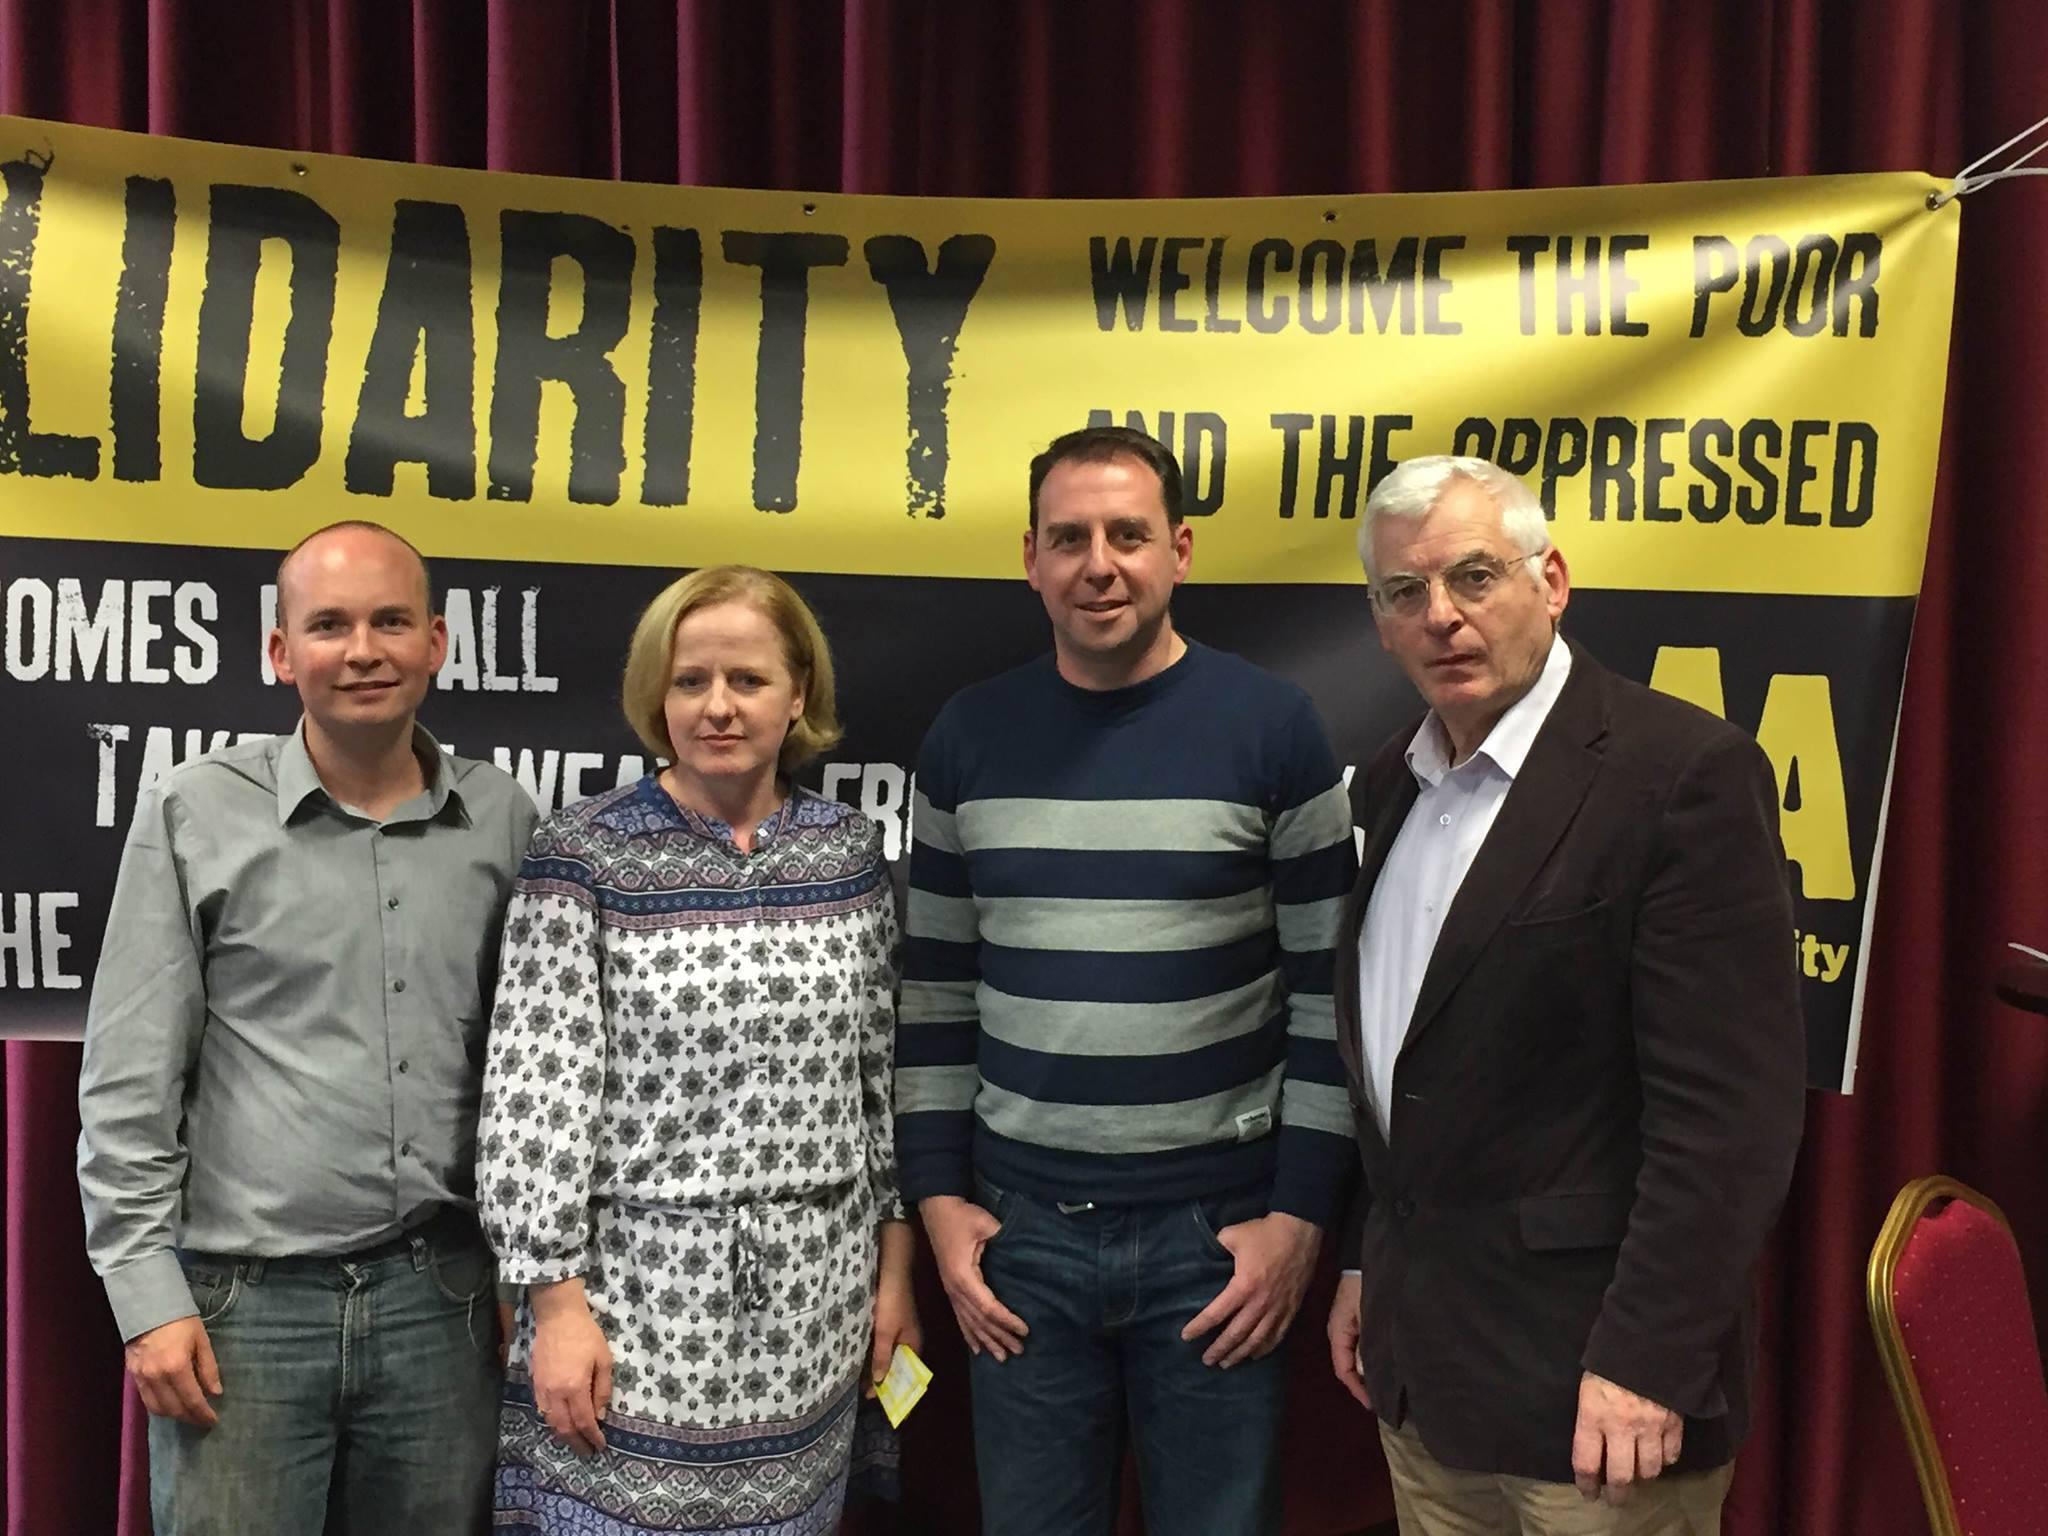 Paul Murphy, TD, Ruth Coppinger, TD, Michael O'Brien, Cllr and Joe Higgins TD